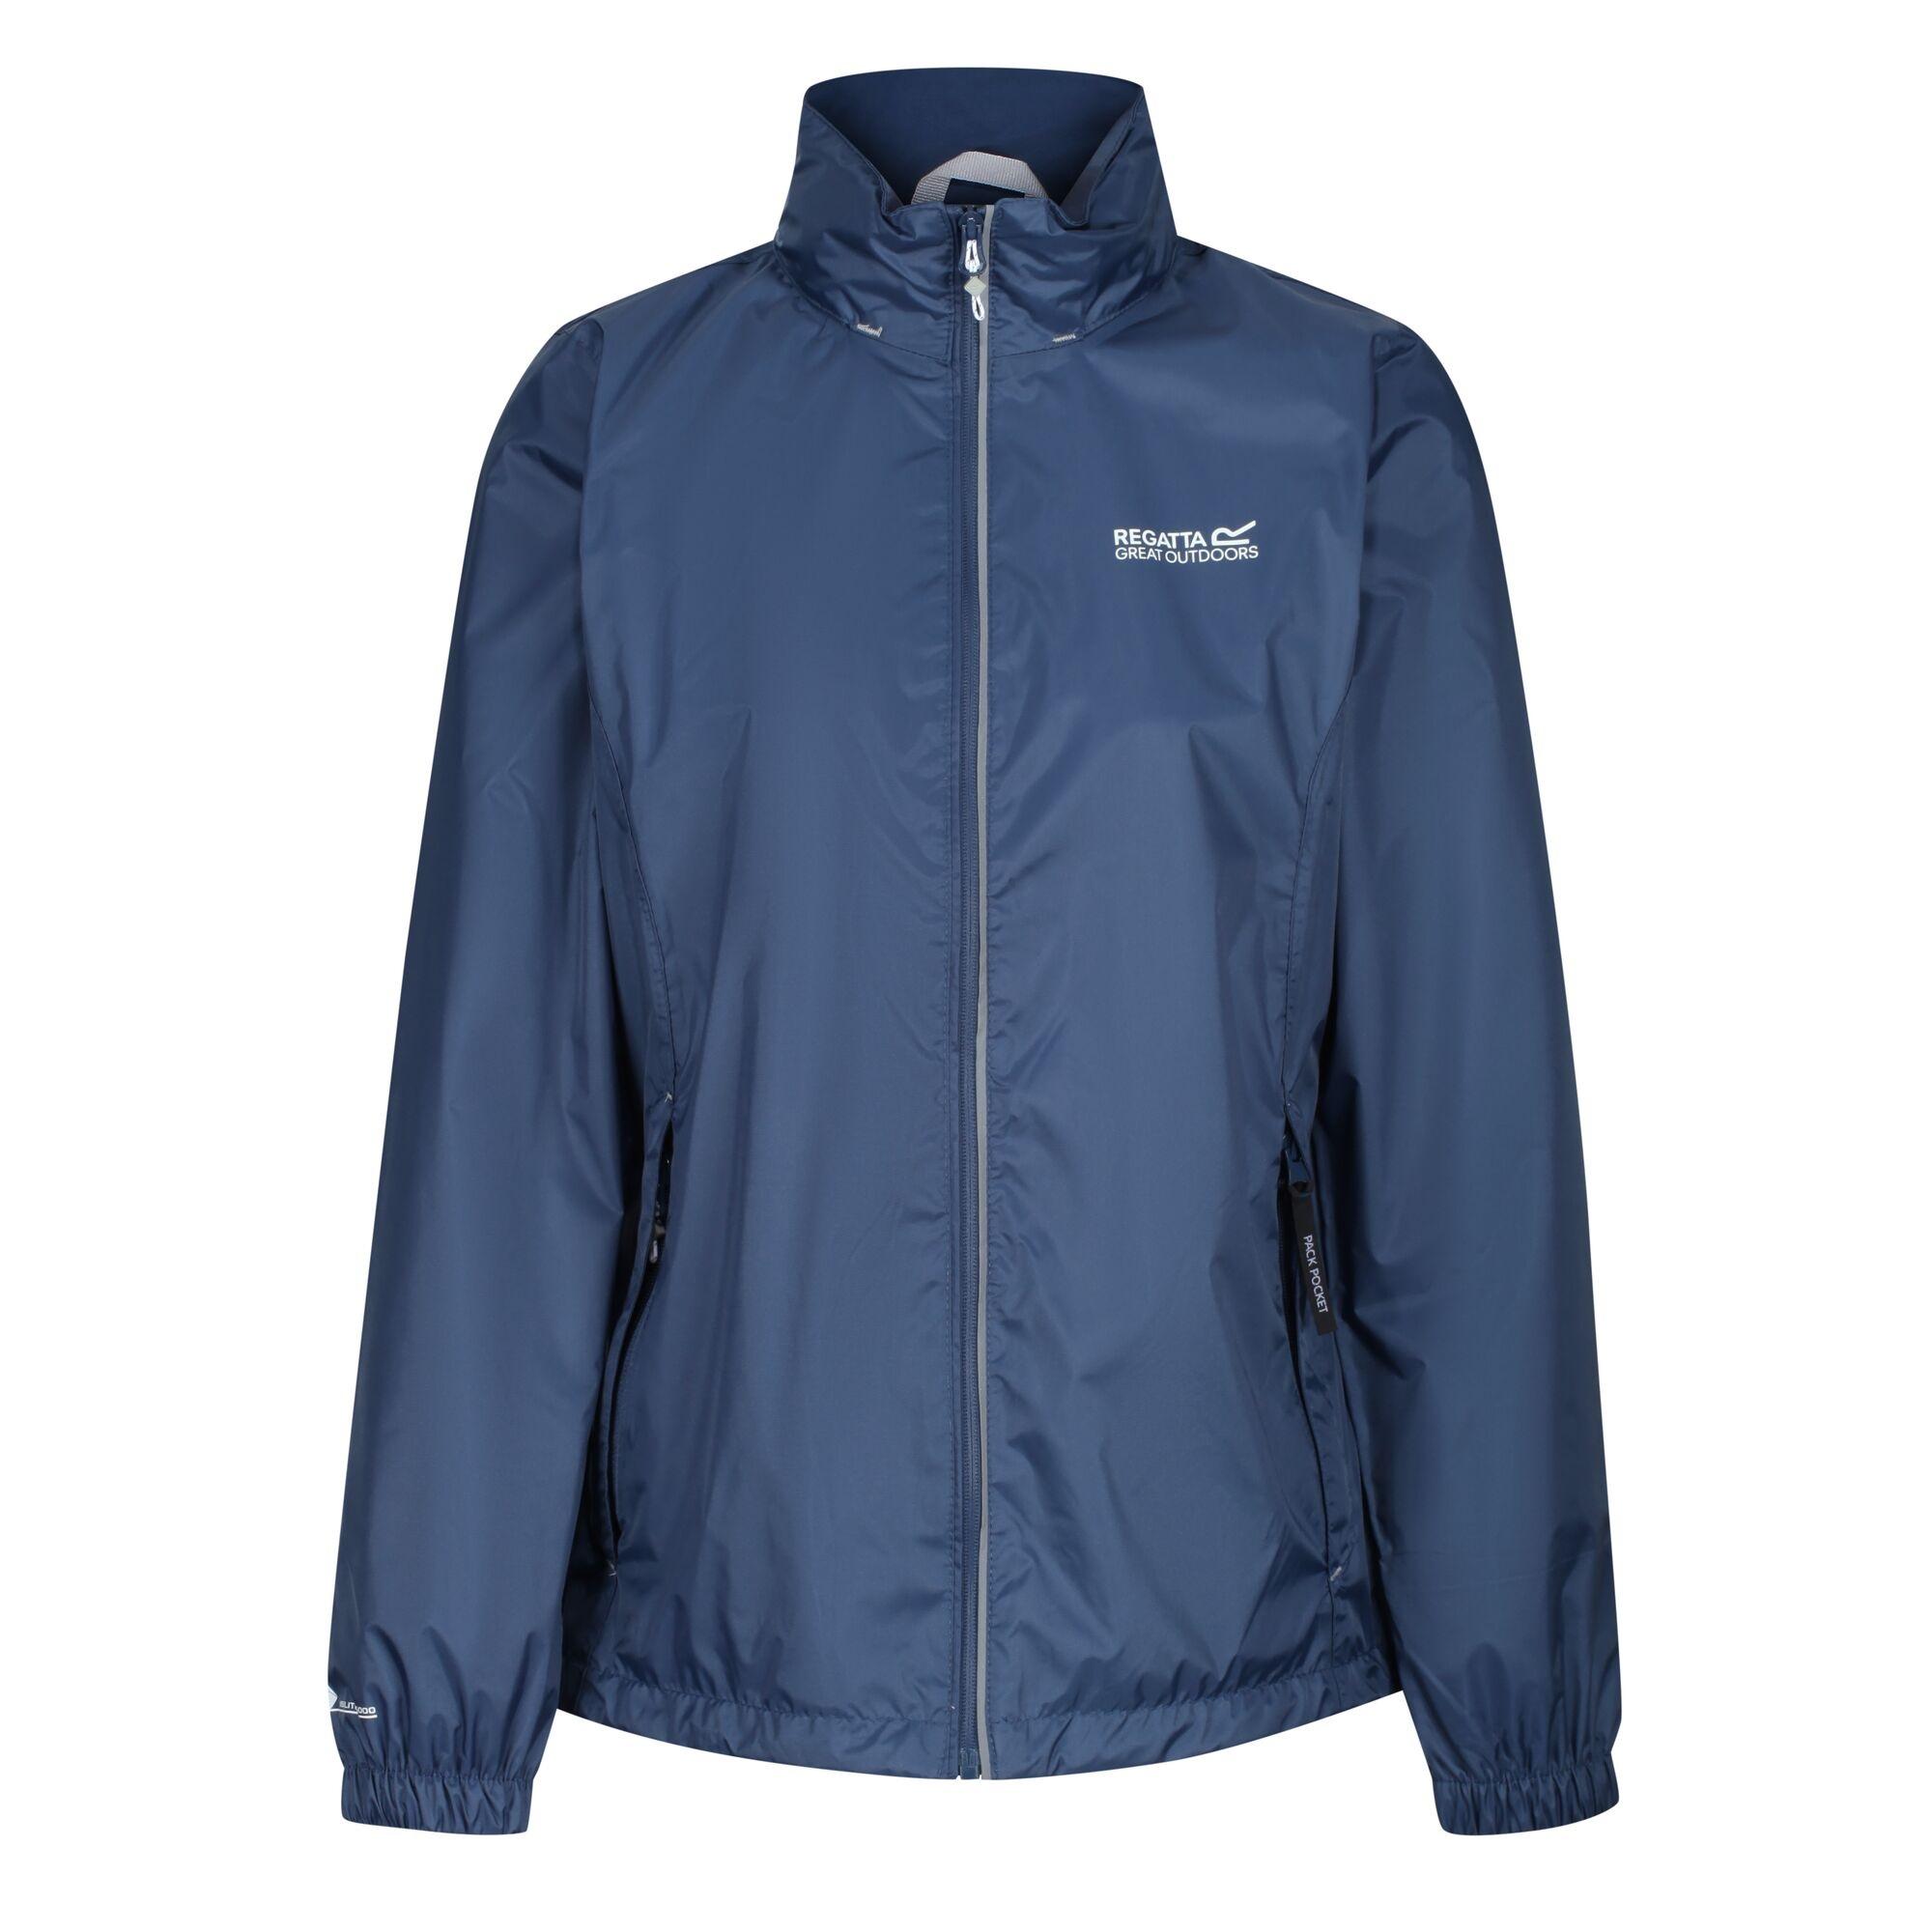 Regatta Womens/Ladies Corinne IV Waterproof Jacket (12 UK) (Dark Denim)